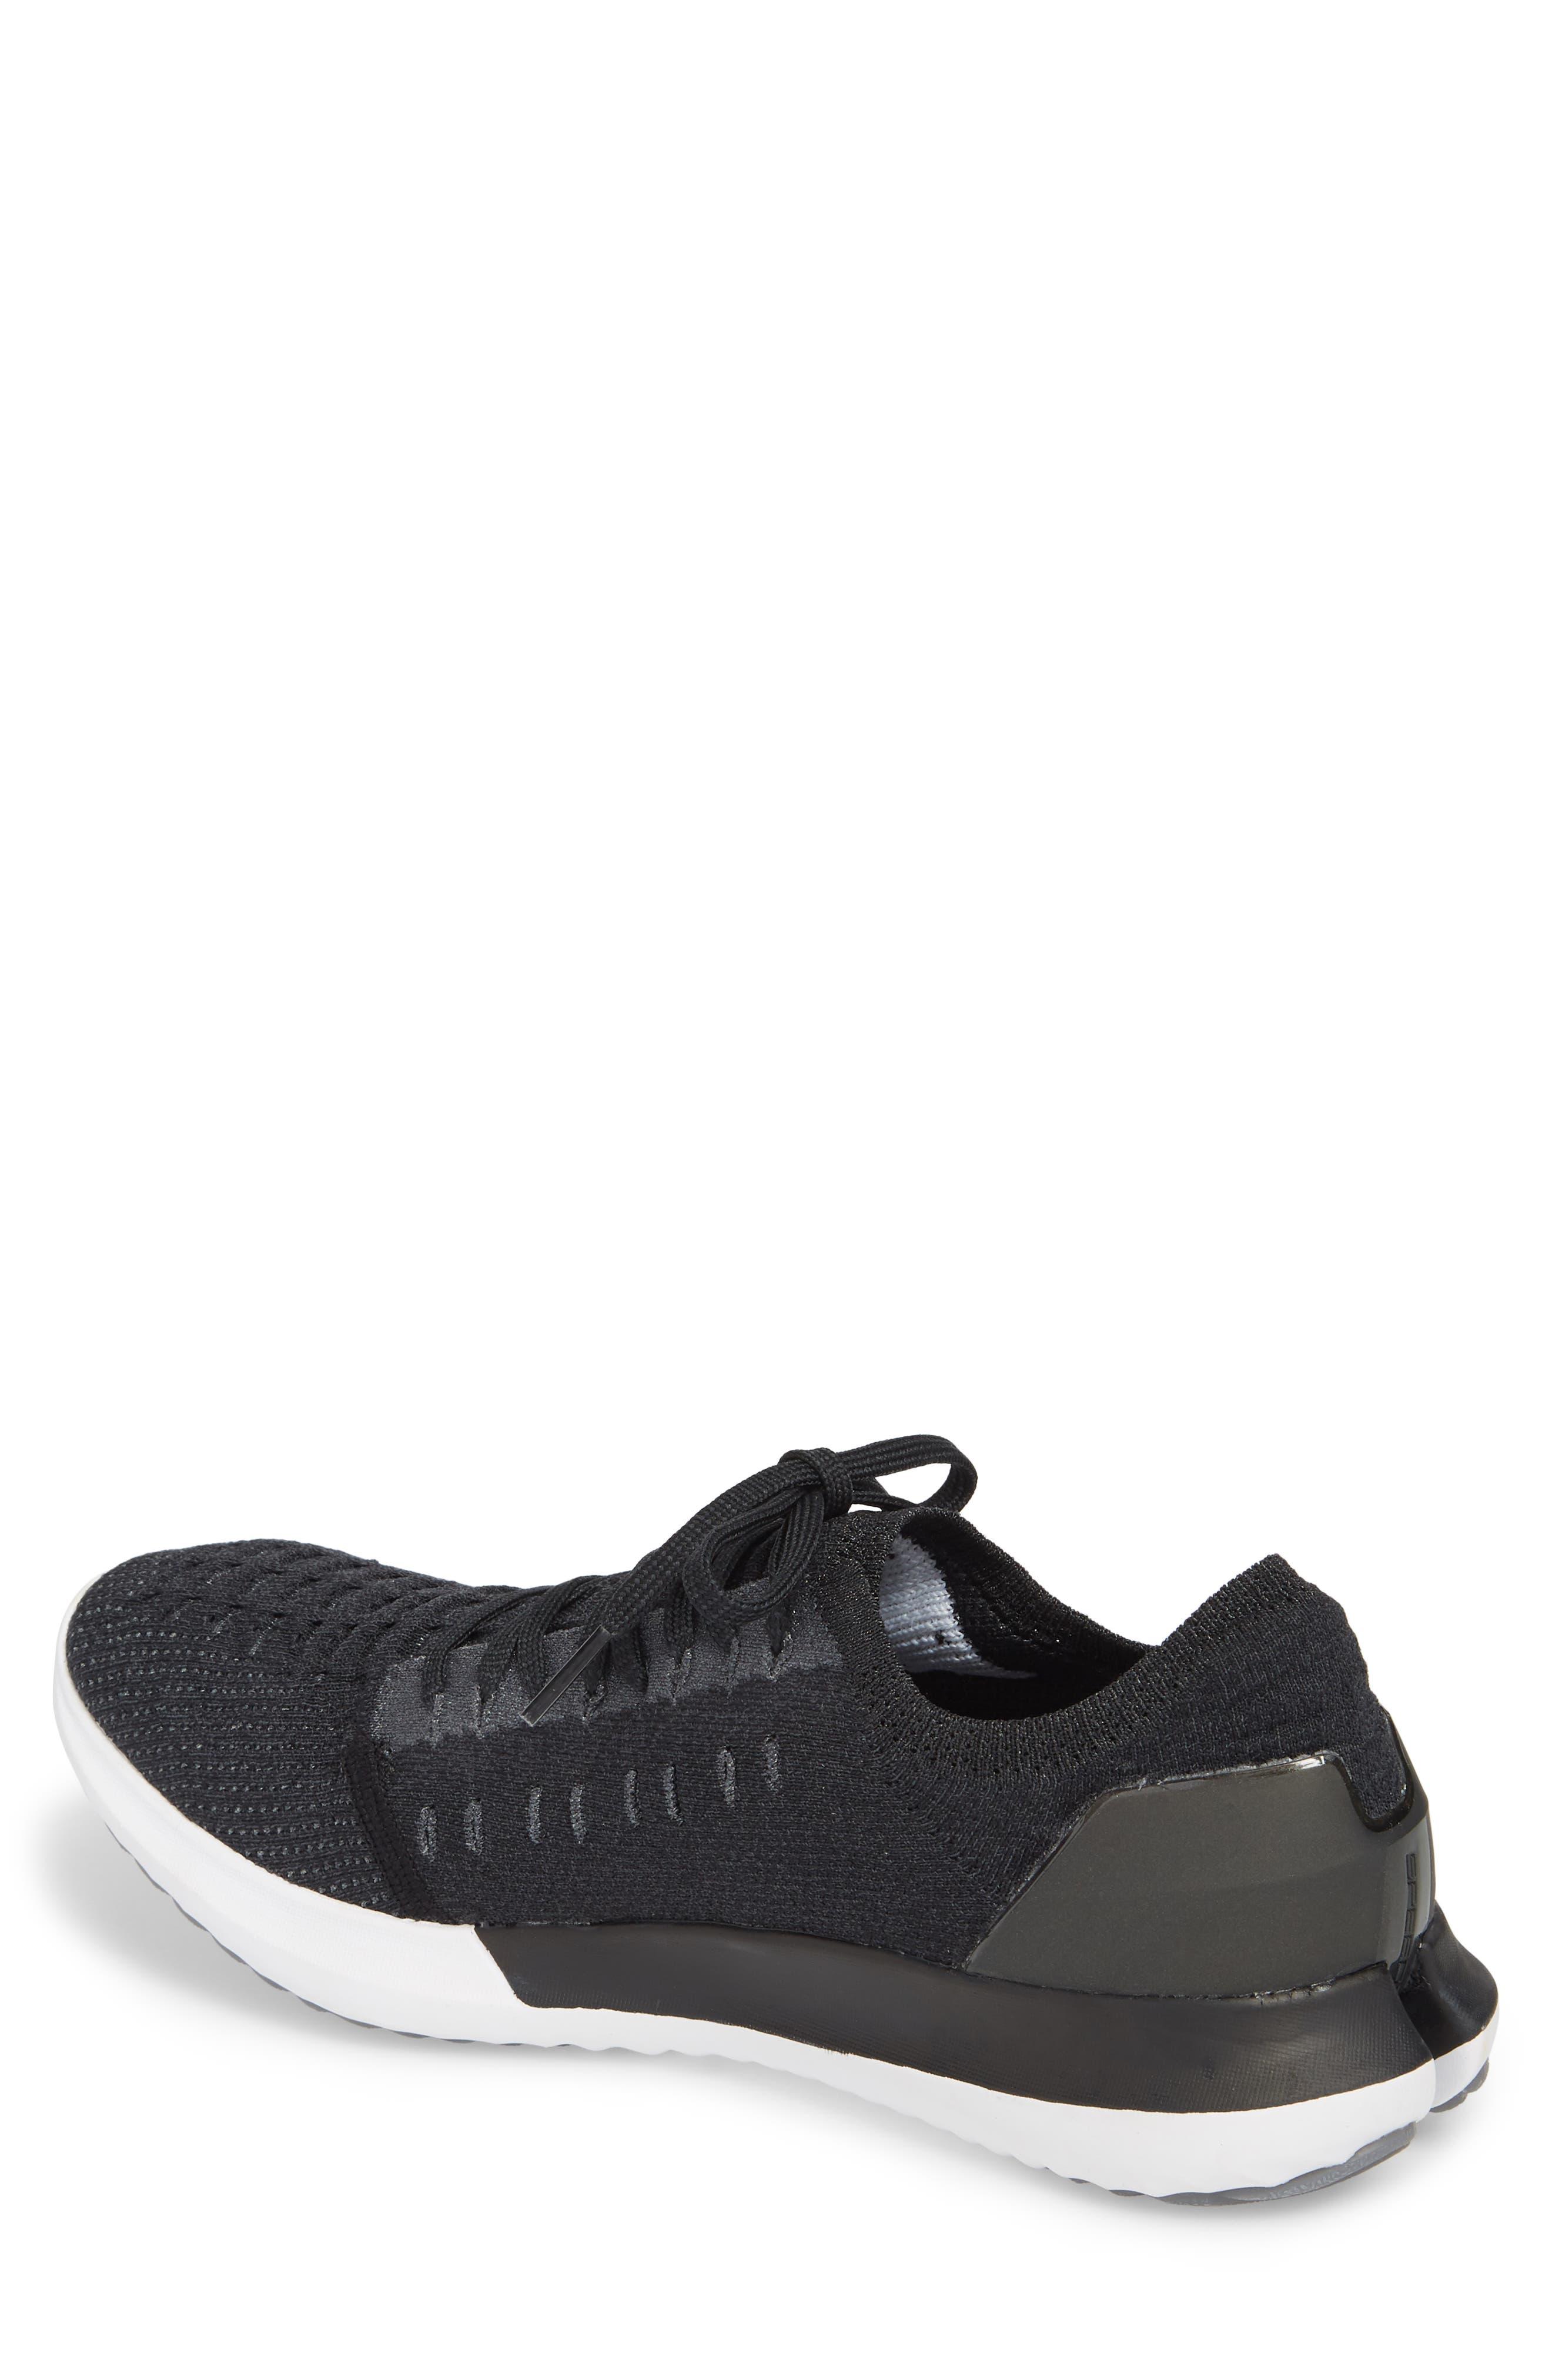 Speedform<sup>®</sup> Slingshot 2 Sneaker,                             Alternate thumbnail 2, color,                             BLACK / ANTHRACITE / METALLIC